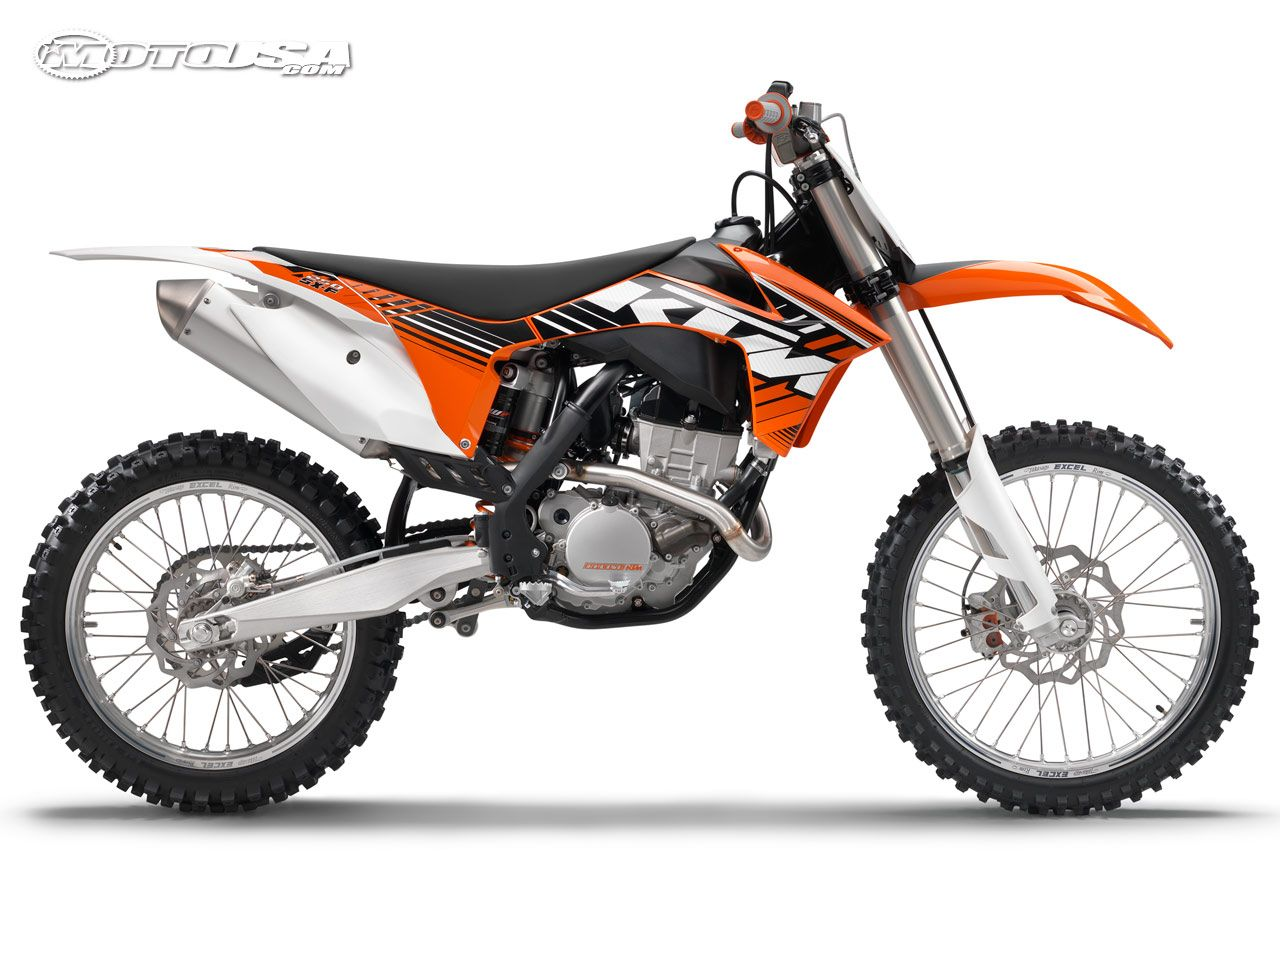 Ktm 250 Sx F Ktm Enduro Enduro Motorcycle Ktm Motocross